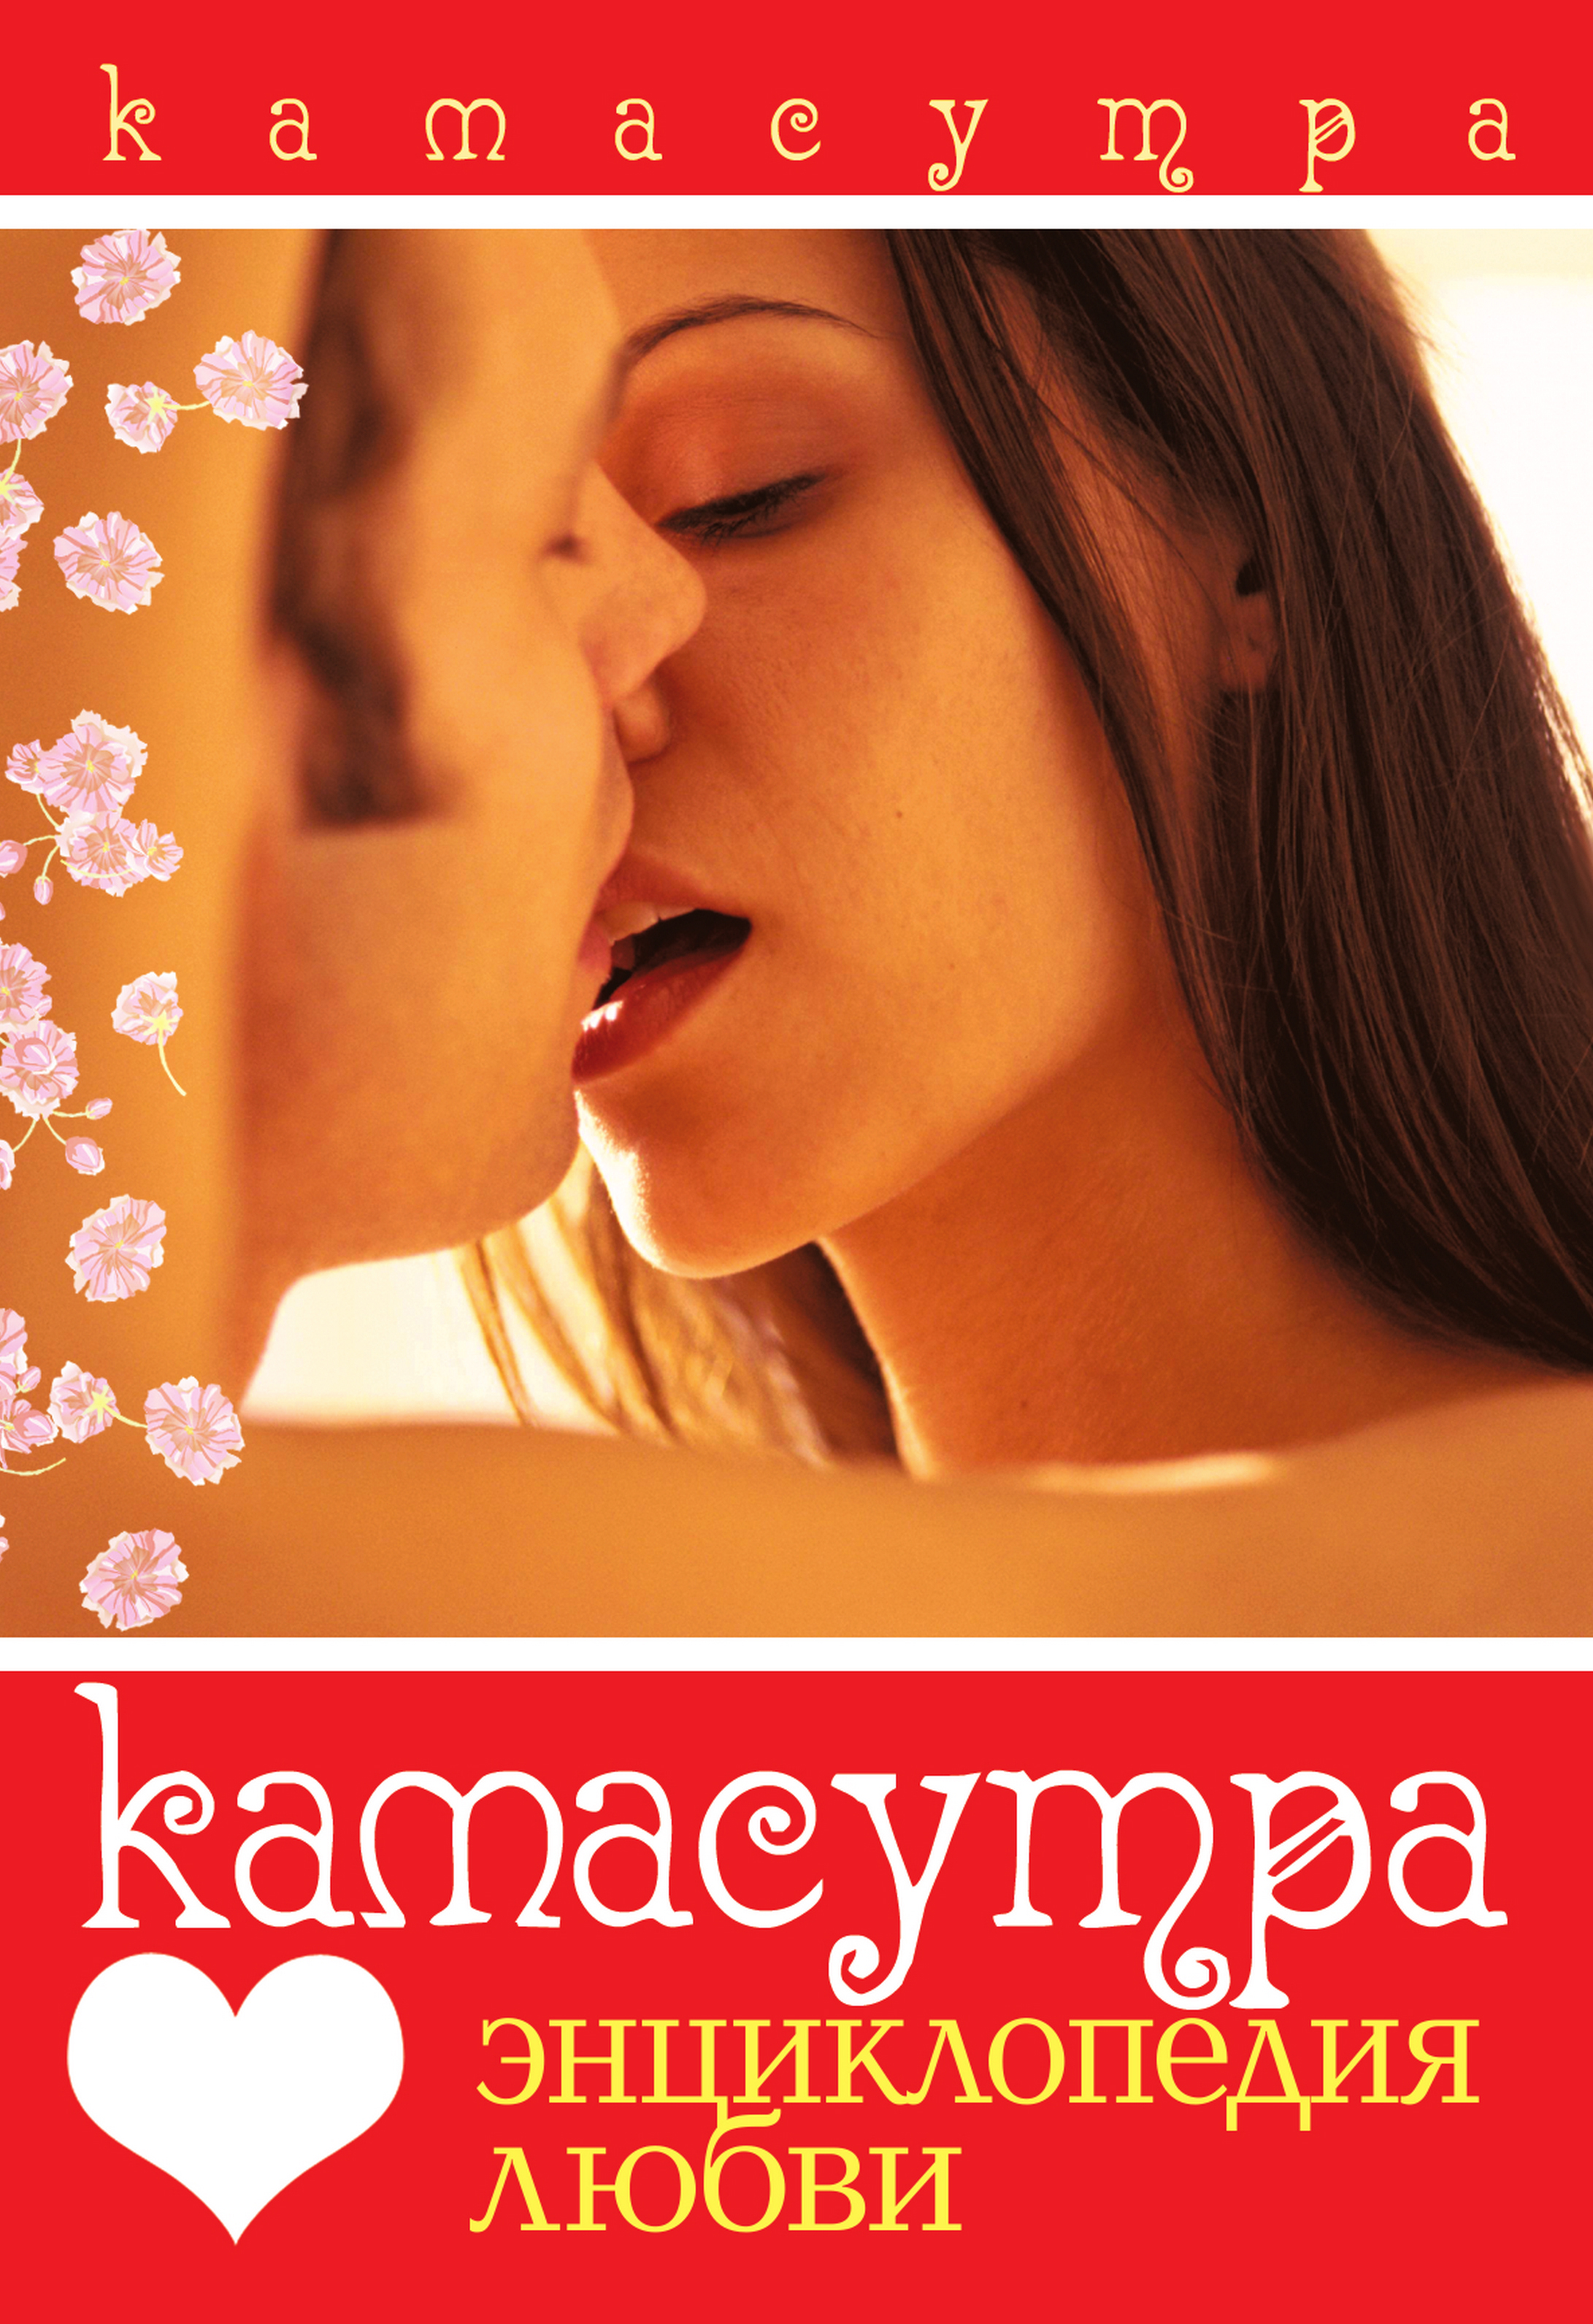 Камасутра женский оргазм бесплатно